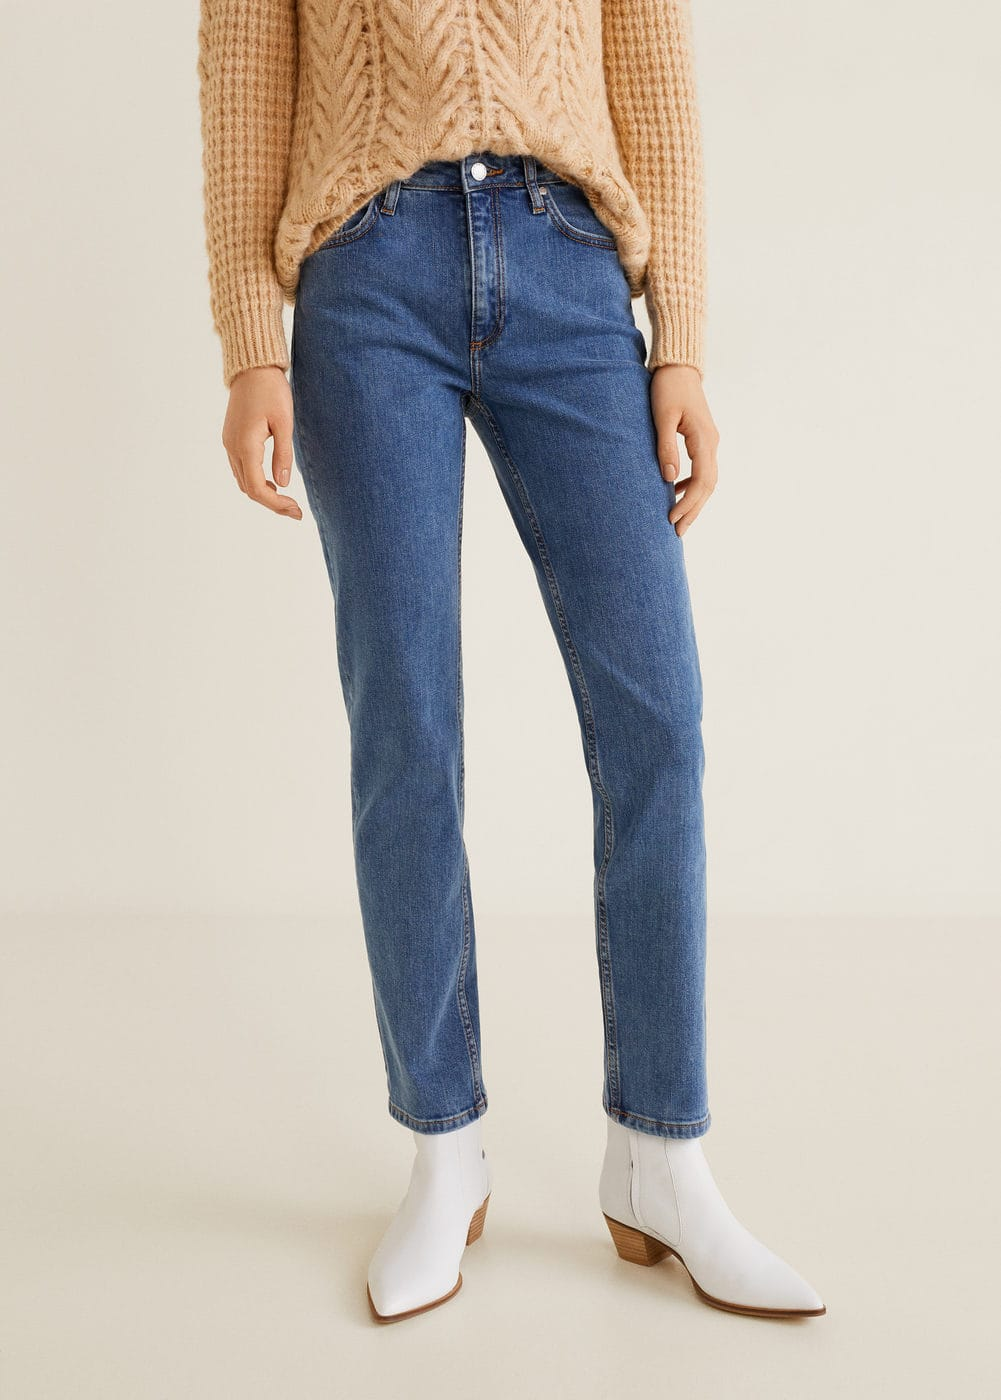 Mango - Jeans straight Anna - 1